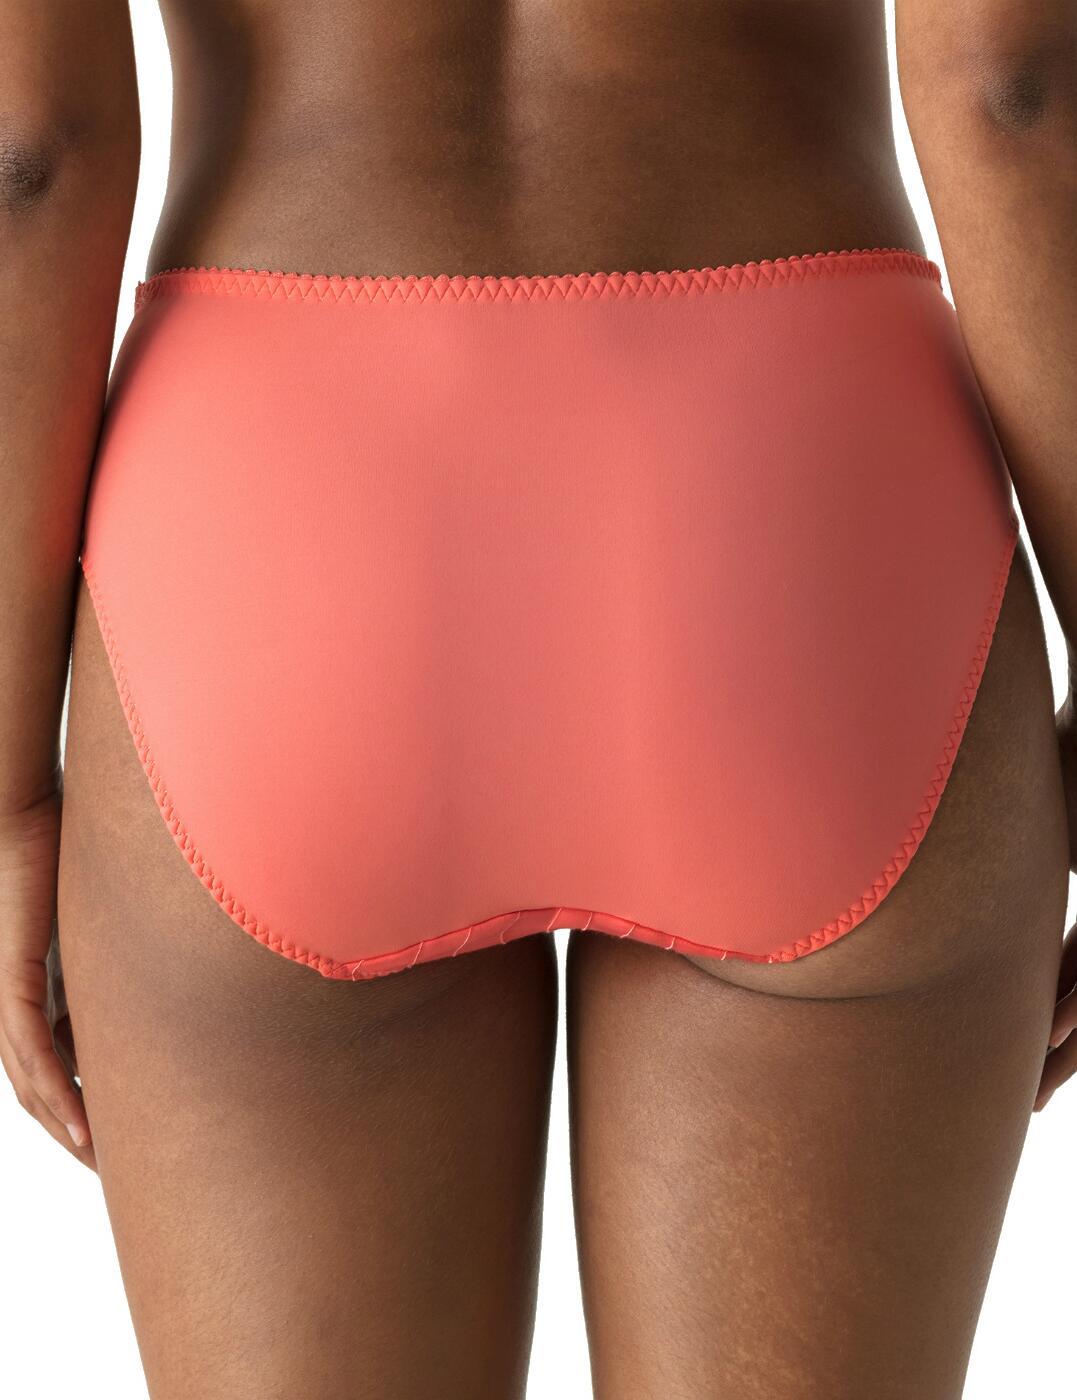 Prima-Donna-Deauville-Volle-Unterhose-Slip-Slips-Pant-0561811-Luxus-Dessous Indexbild 33